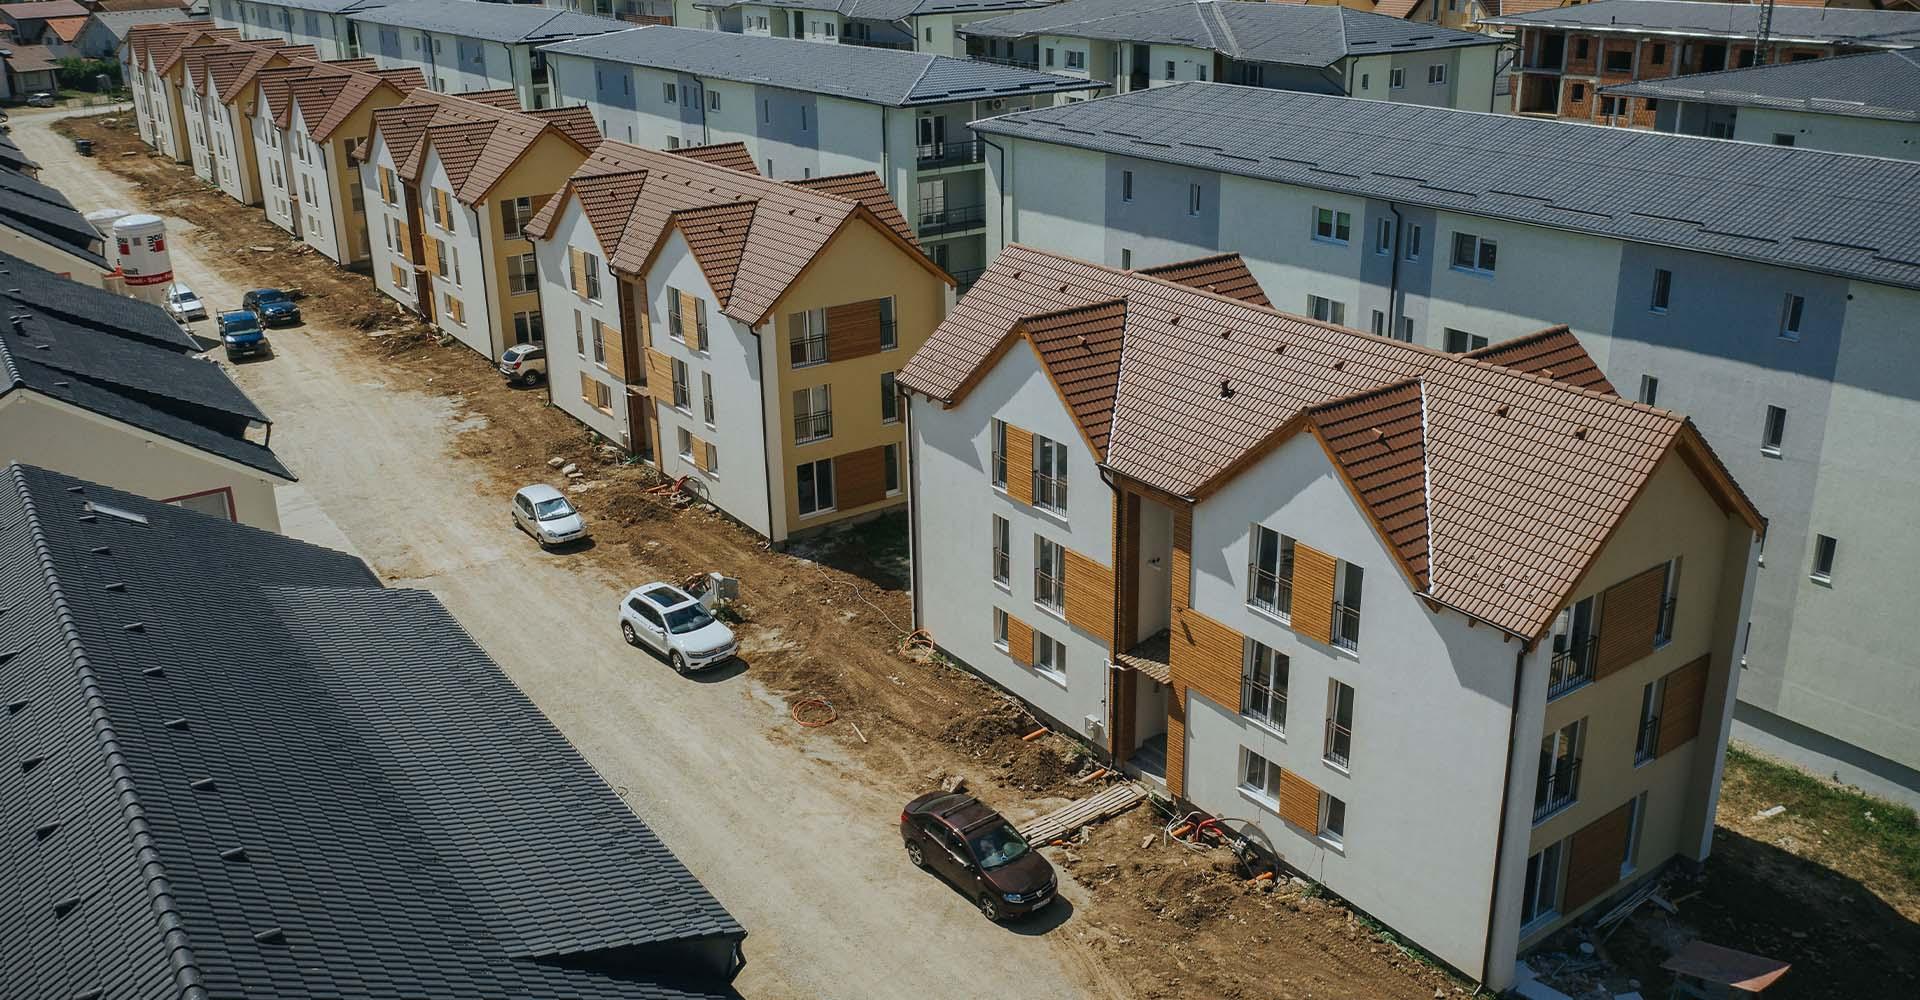 Konsta Residence, Selimbar (42 Wohnungen)